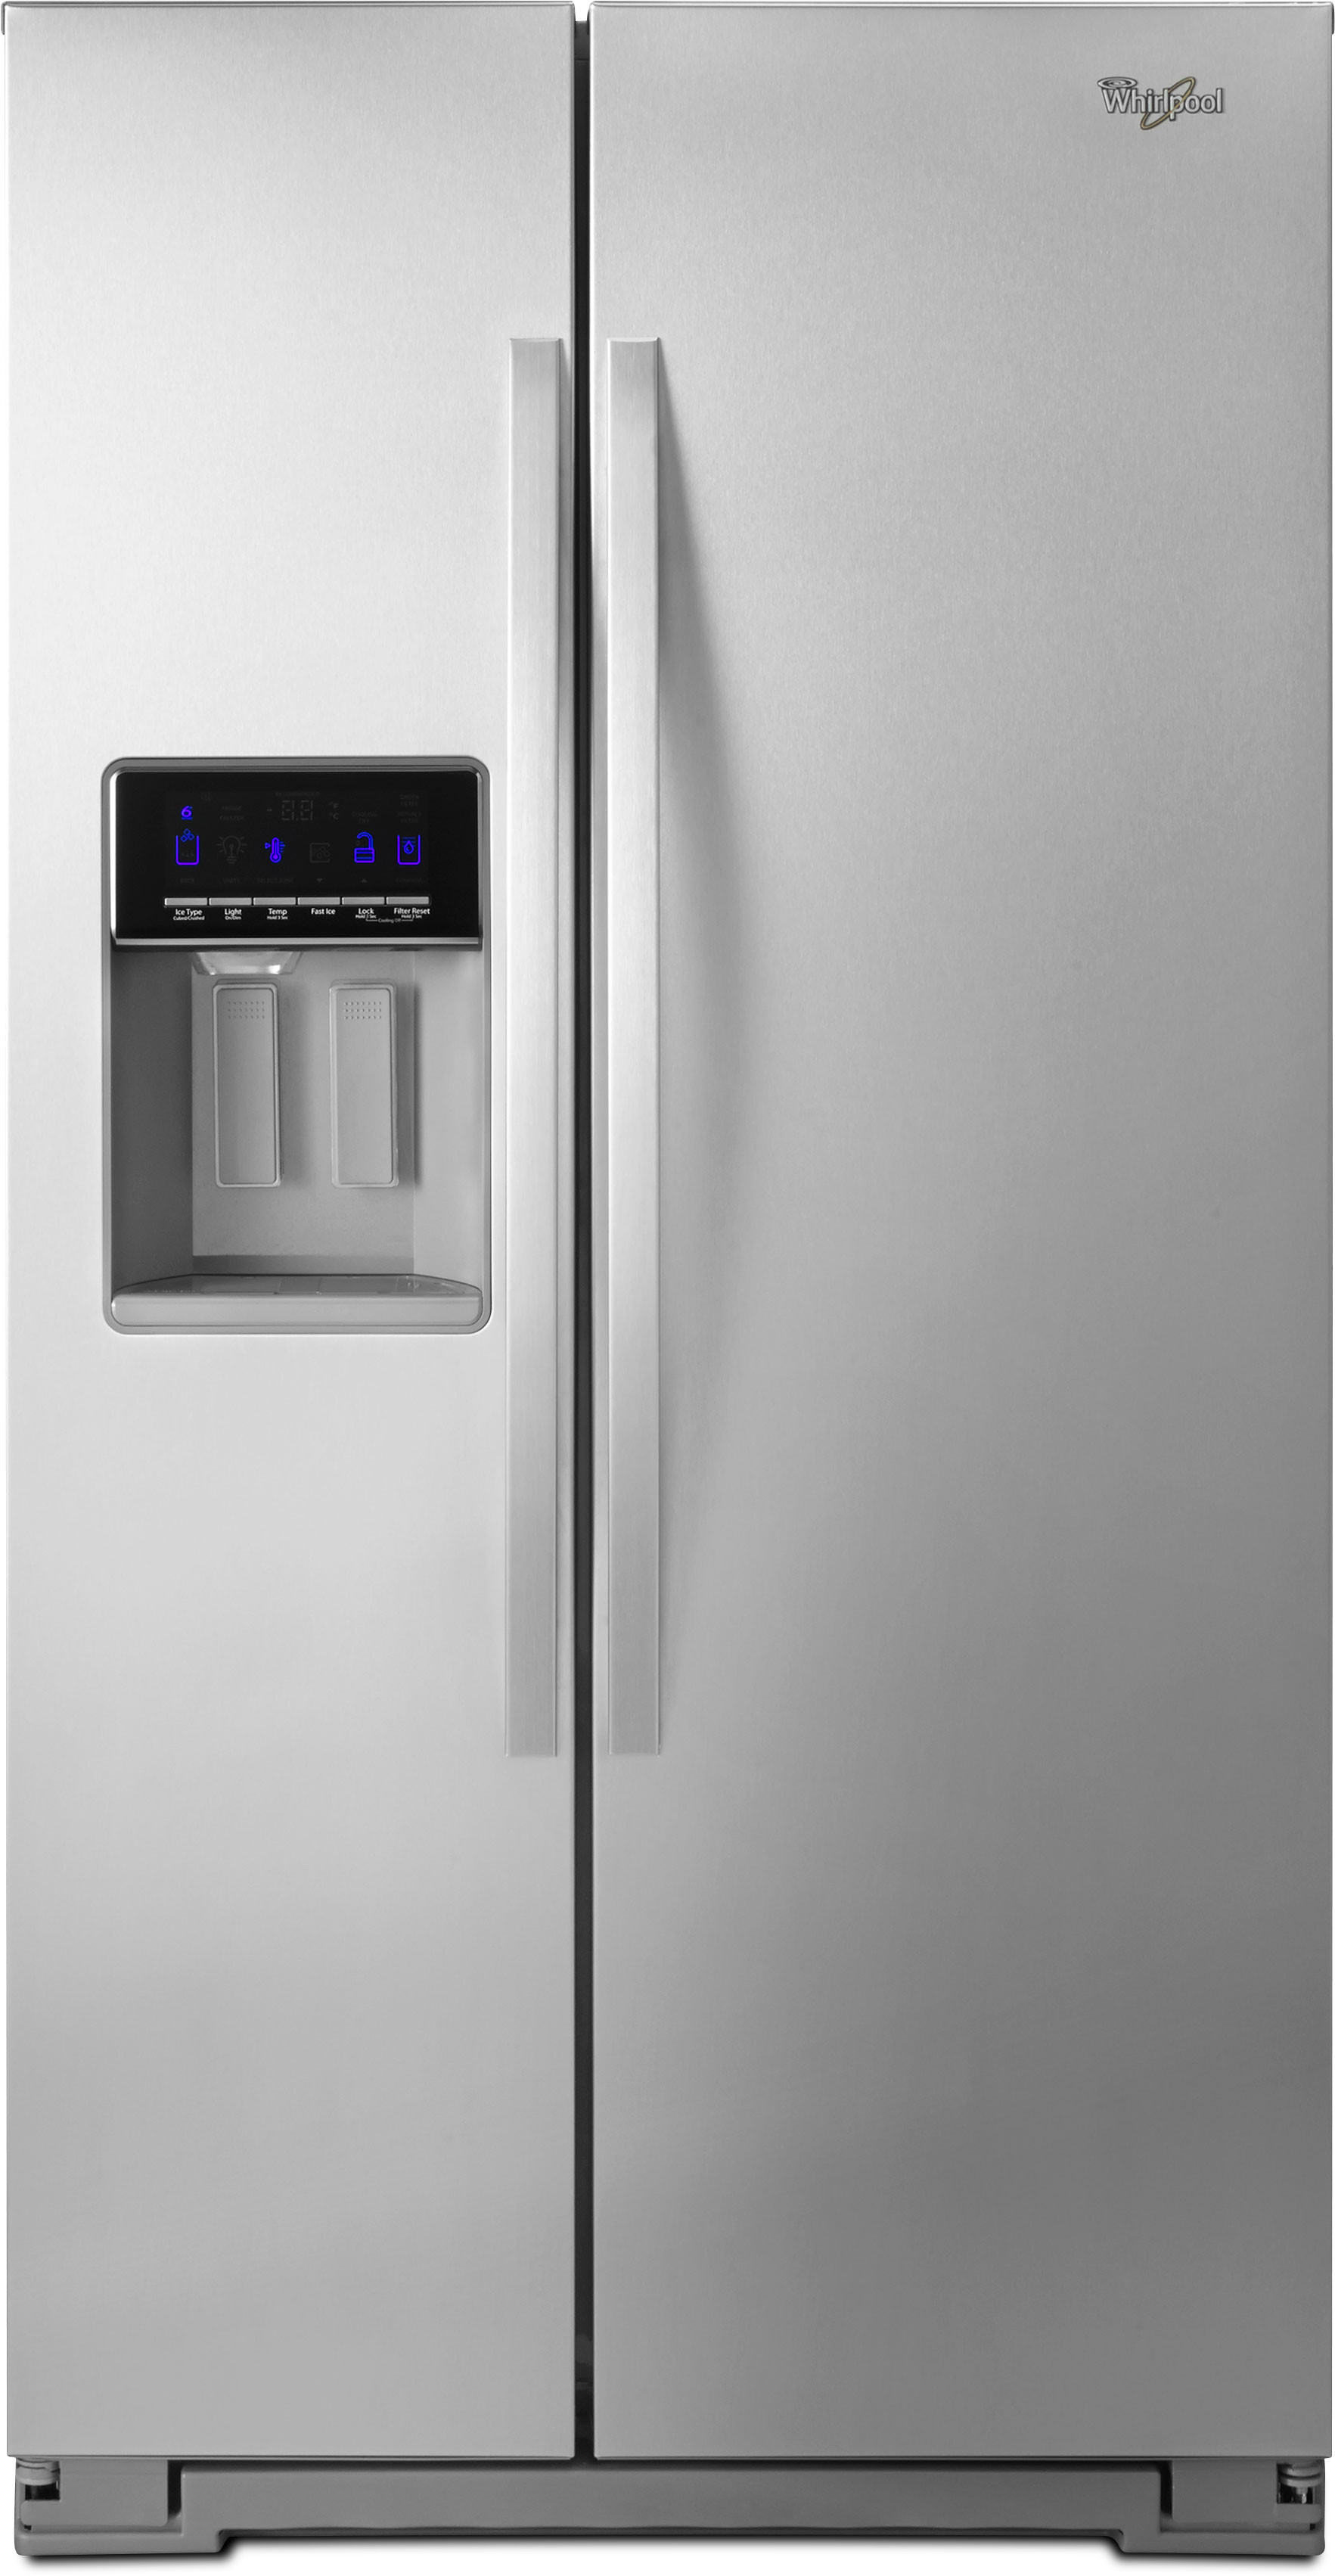 Whirlpool Wrs571cidm 36 Inch Side By Side Refrigerator